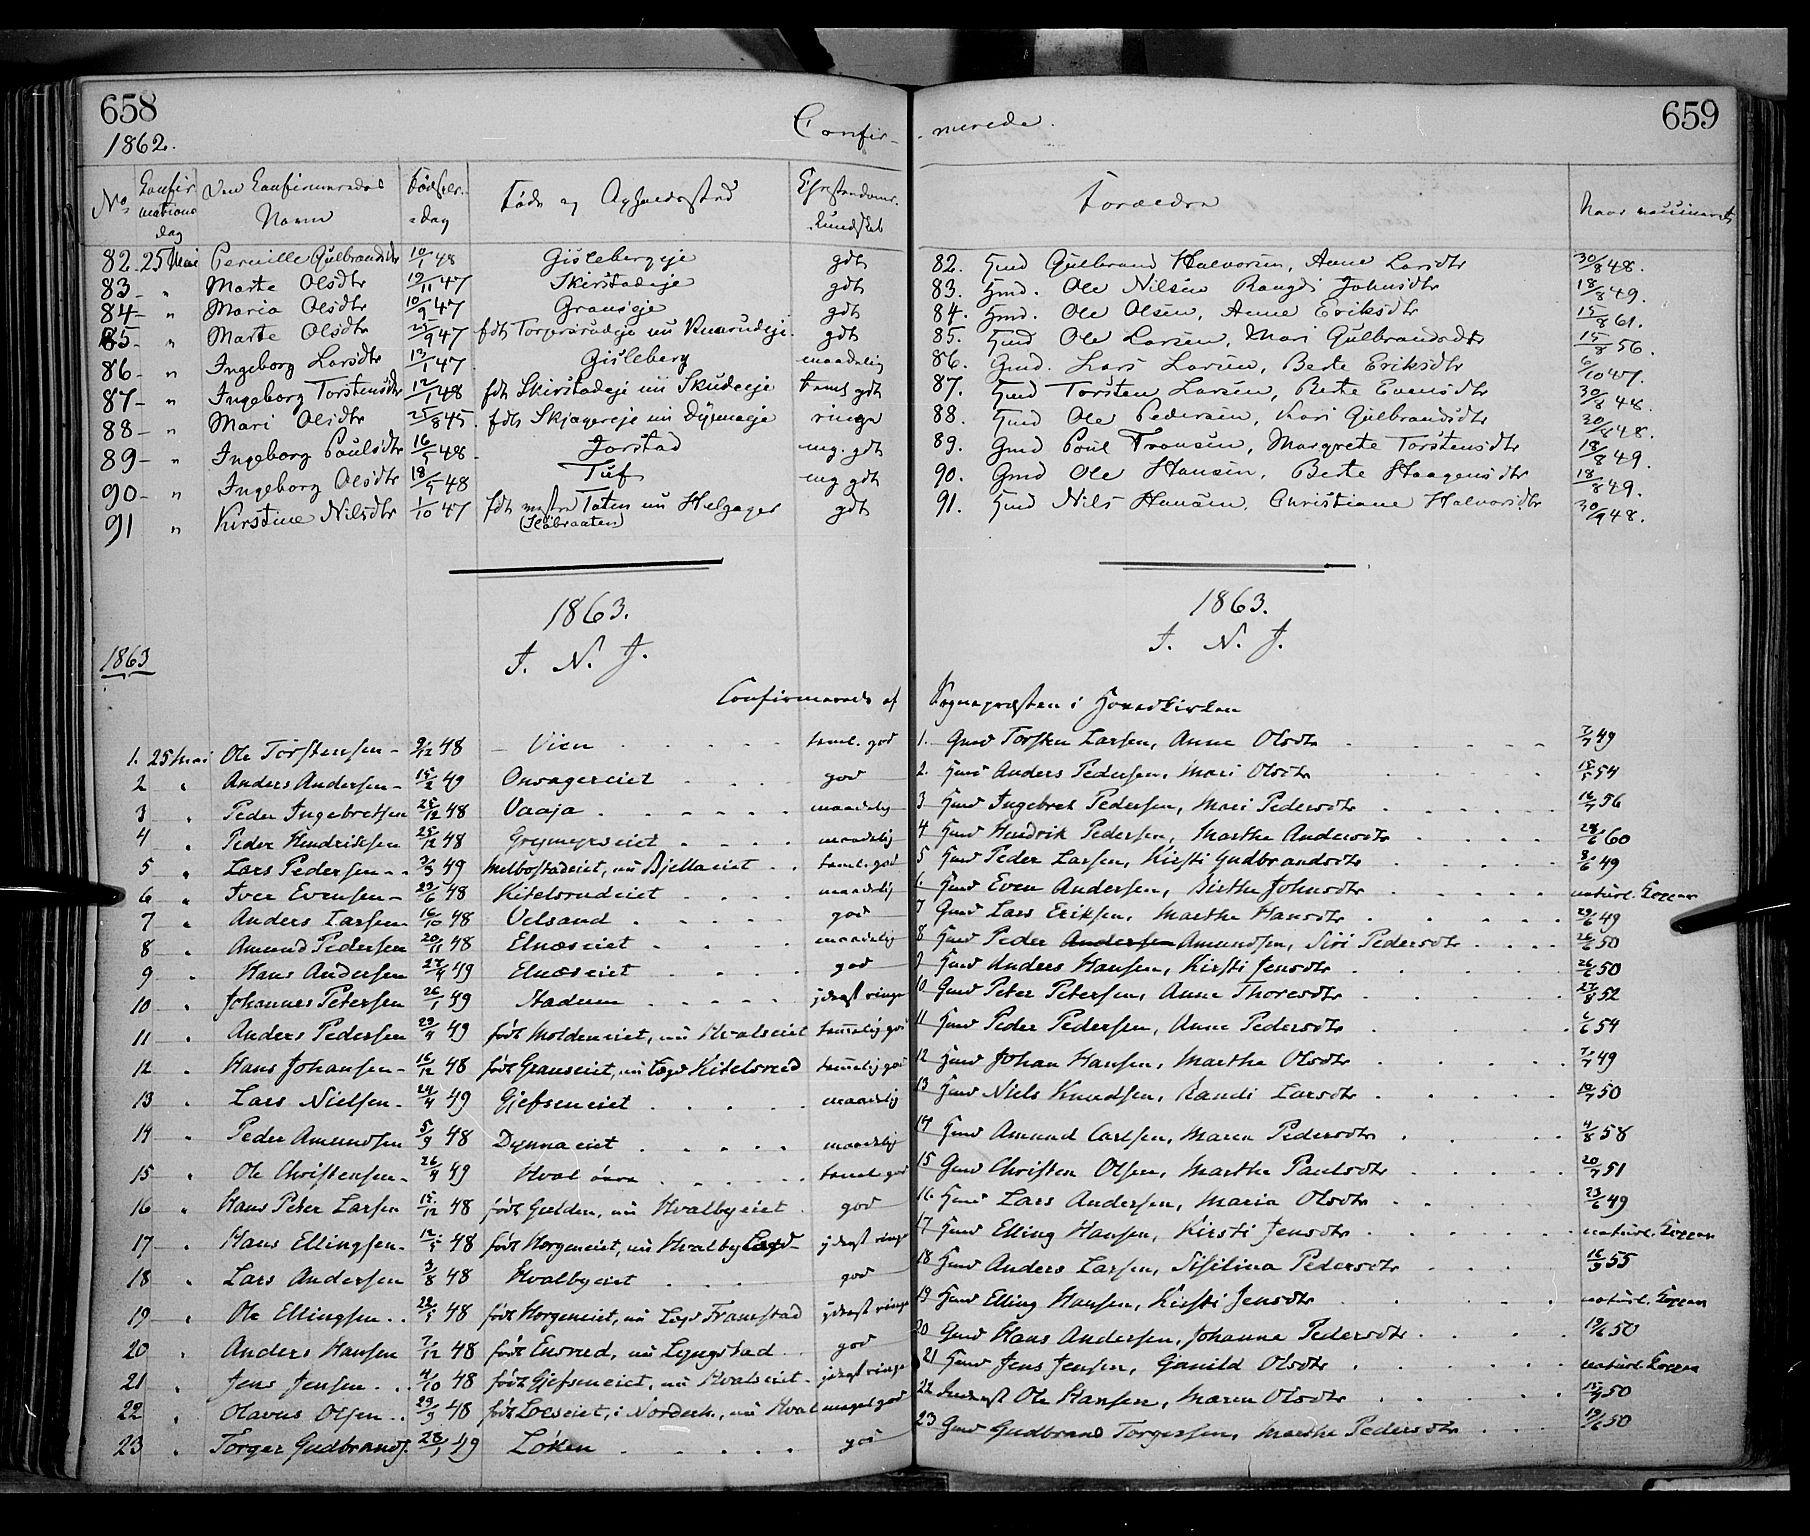 SAH, Gran prestekontor, Ministerialbok nr. 12, 1856-1874, s. 658-659